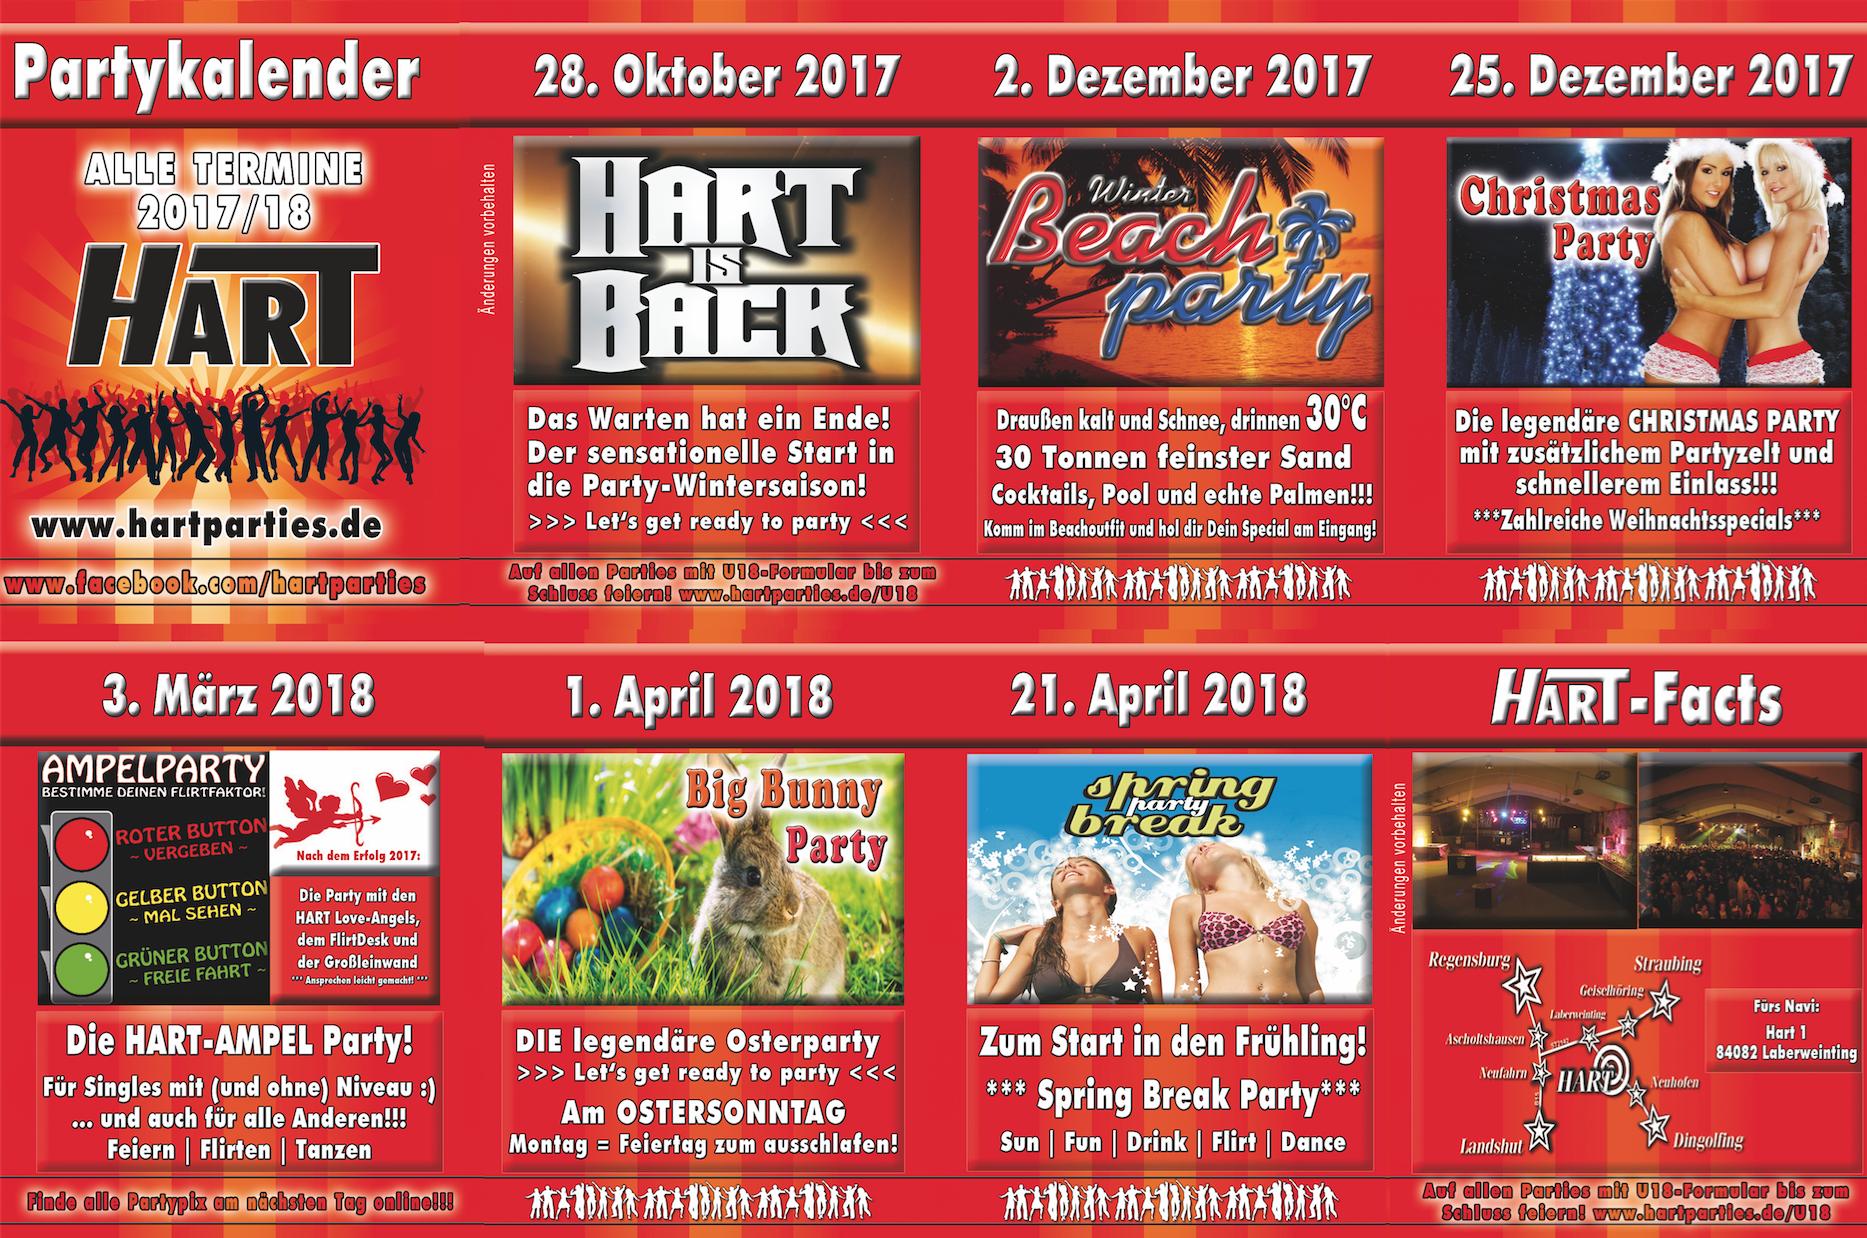 Partykalender 2017-18